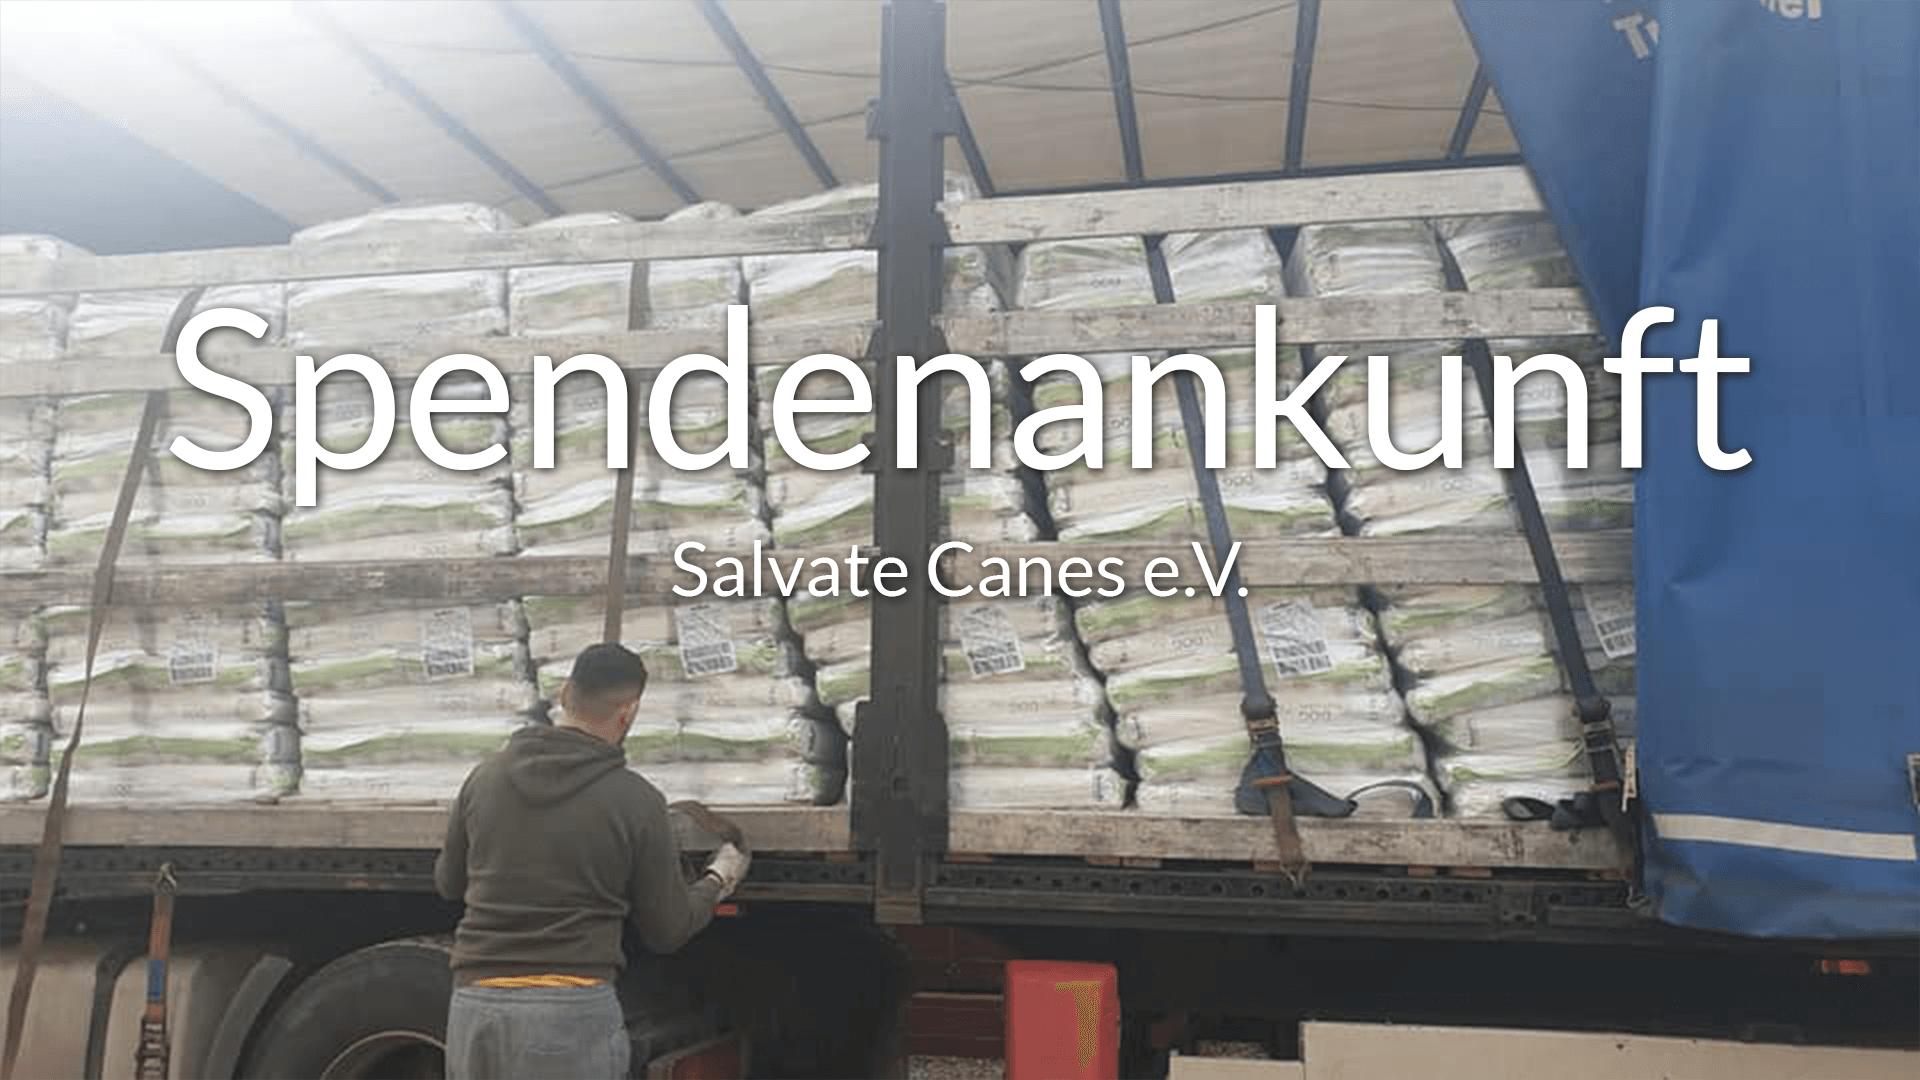 Salvate Canes e.V.-Futterspendenankunft-februar-2020-Spenden-Marathon-2019-Rumänien-VIDEO